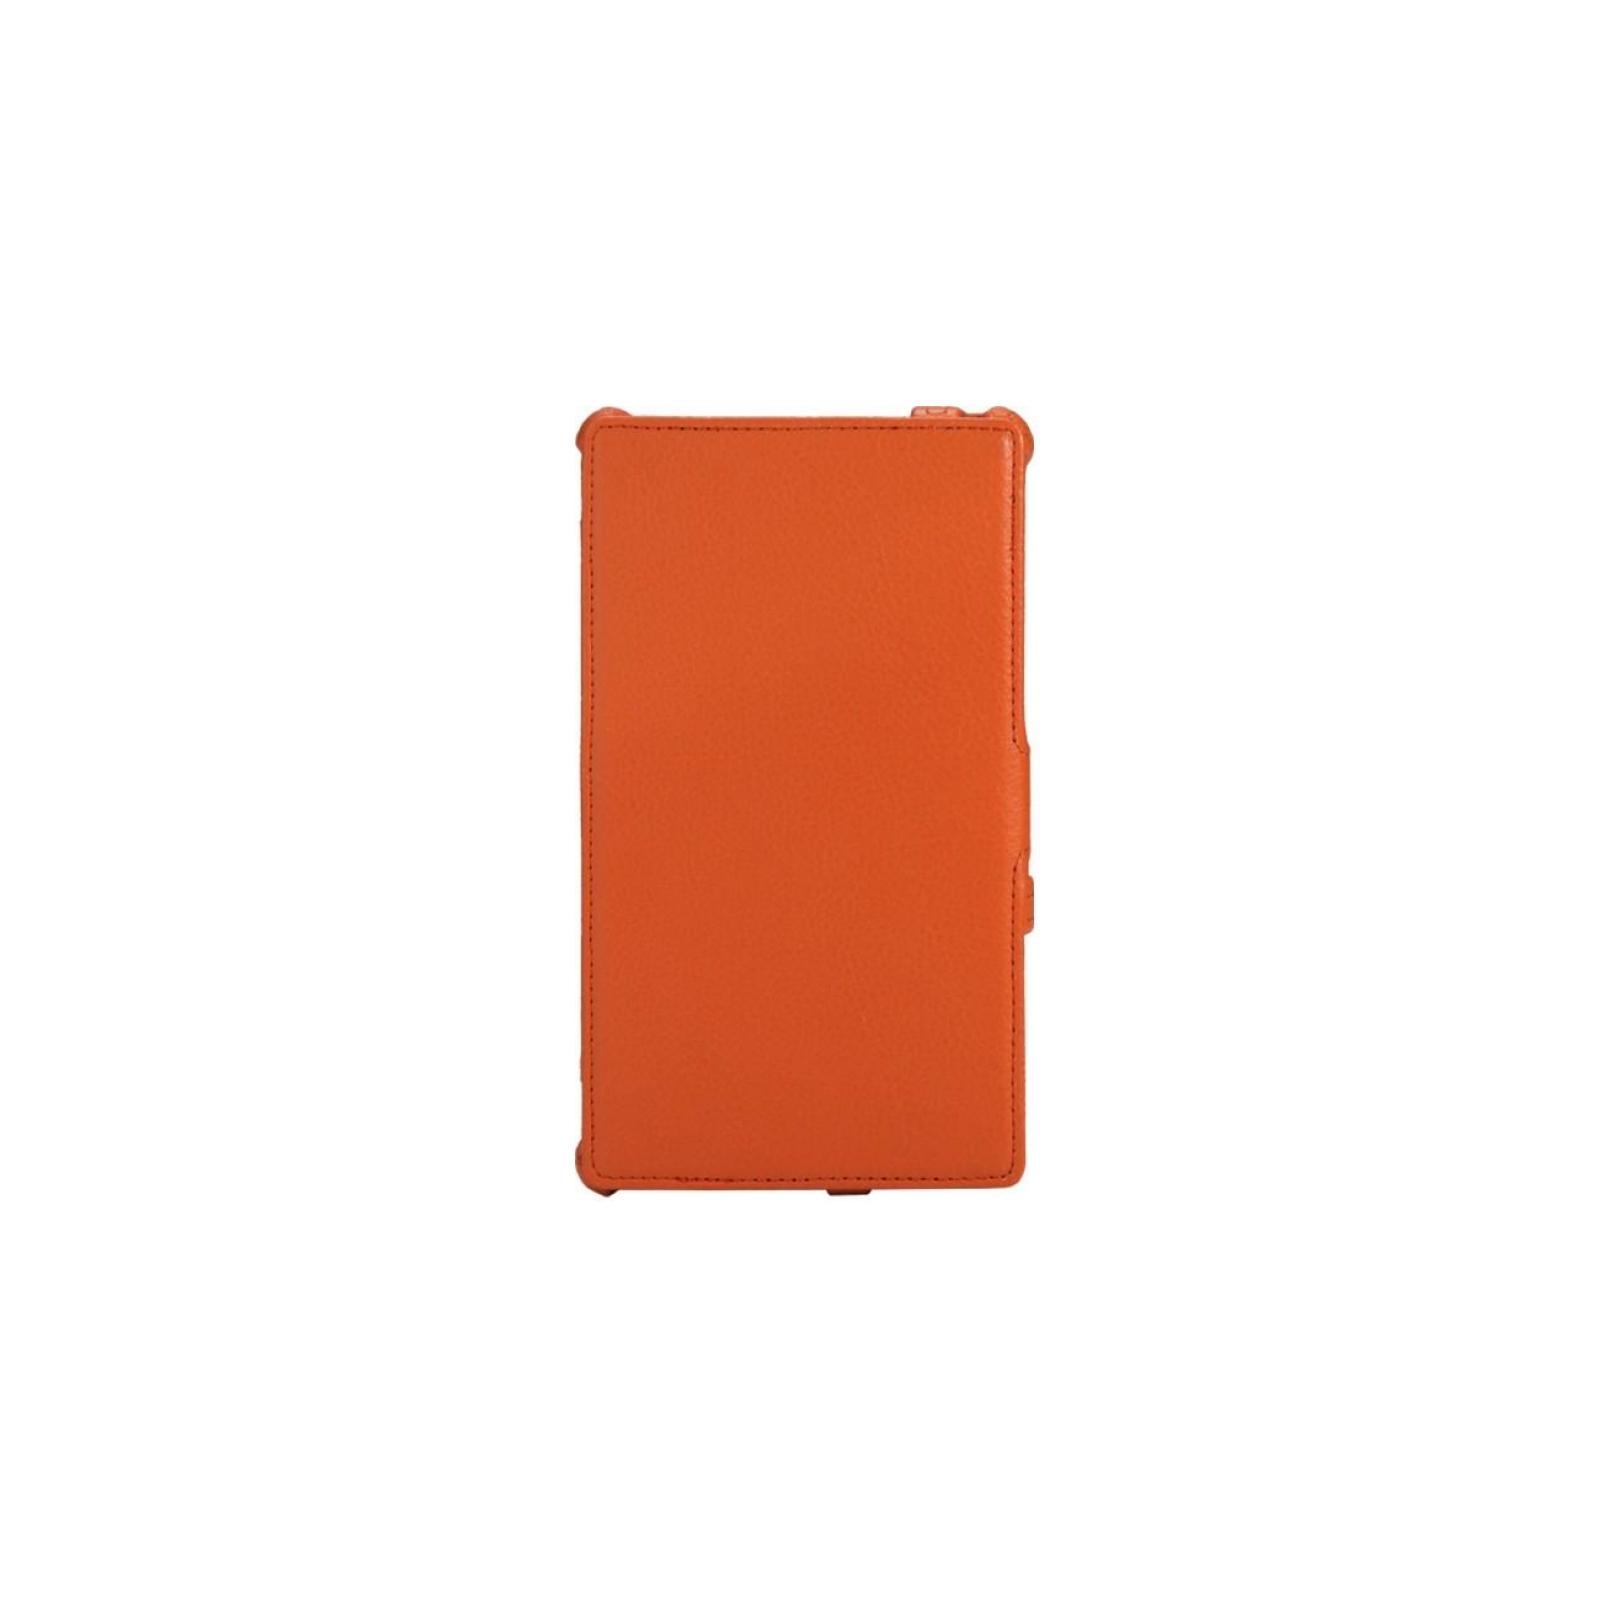 Чехол для планшета AirOn для ASUS ZenPad 7.0 (Z170) (4822352772369)